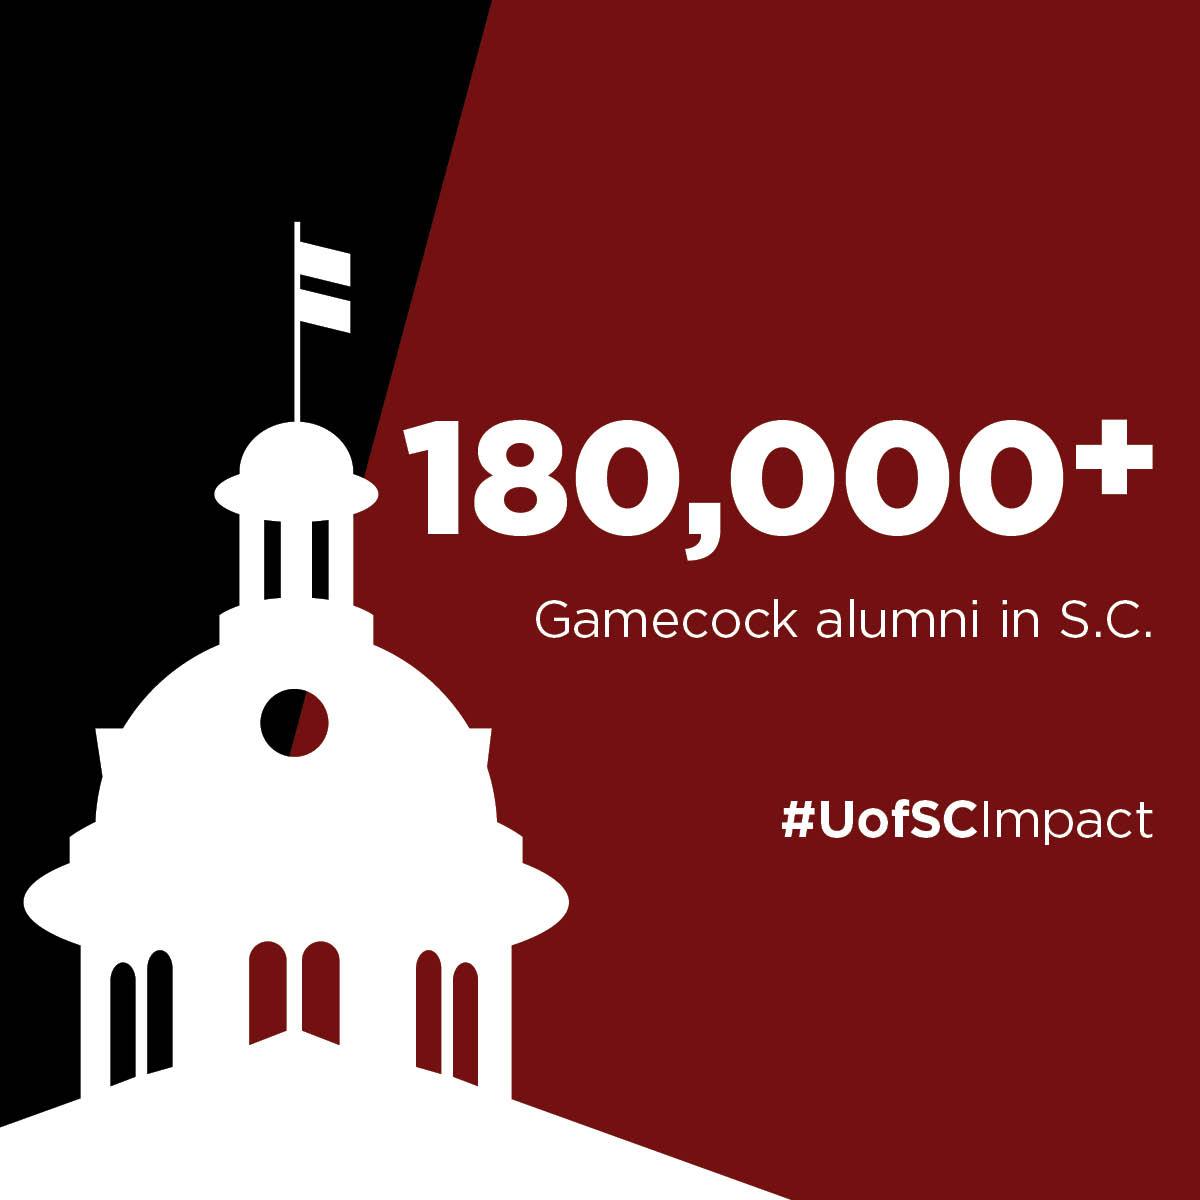 180,000+ Gamecock Alumni in SC #UofSCImpact